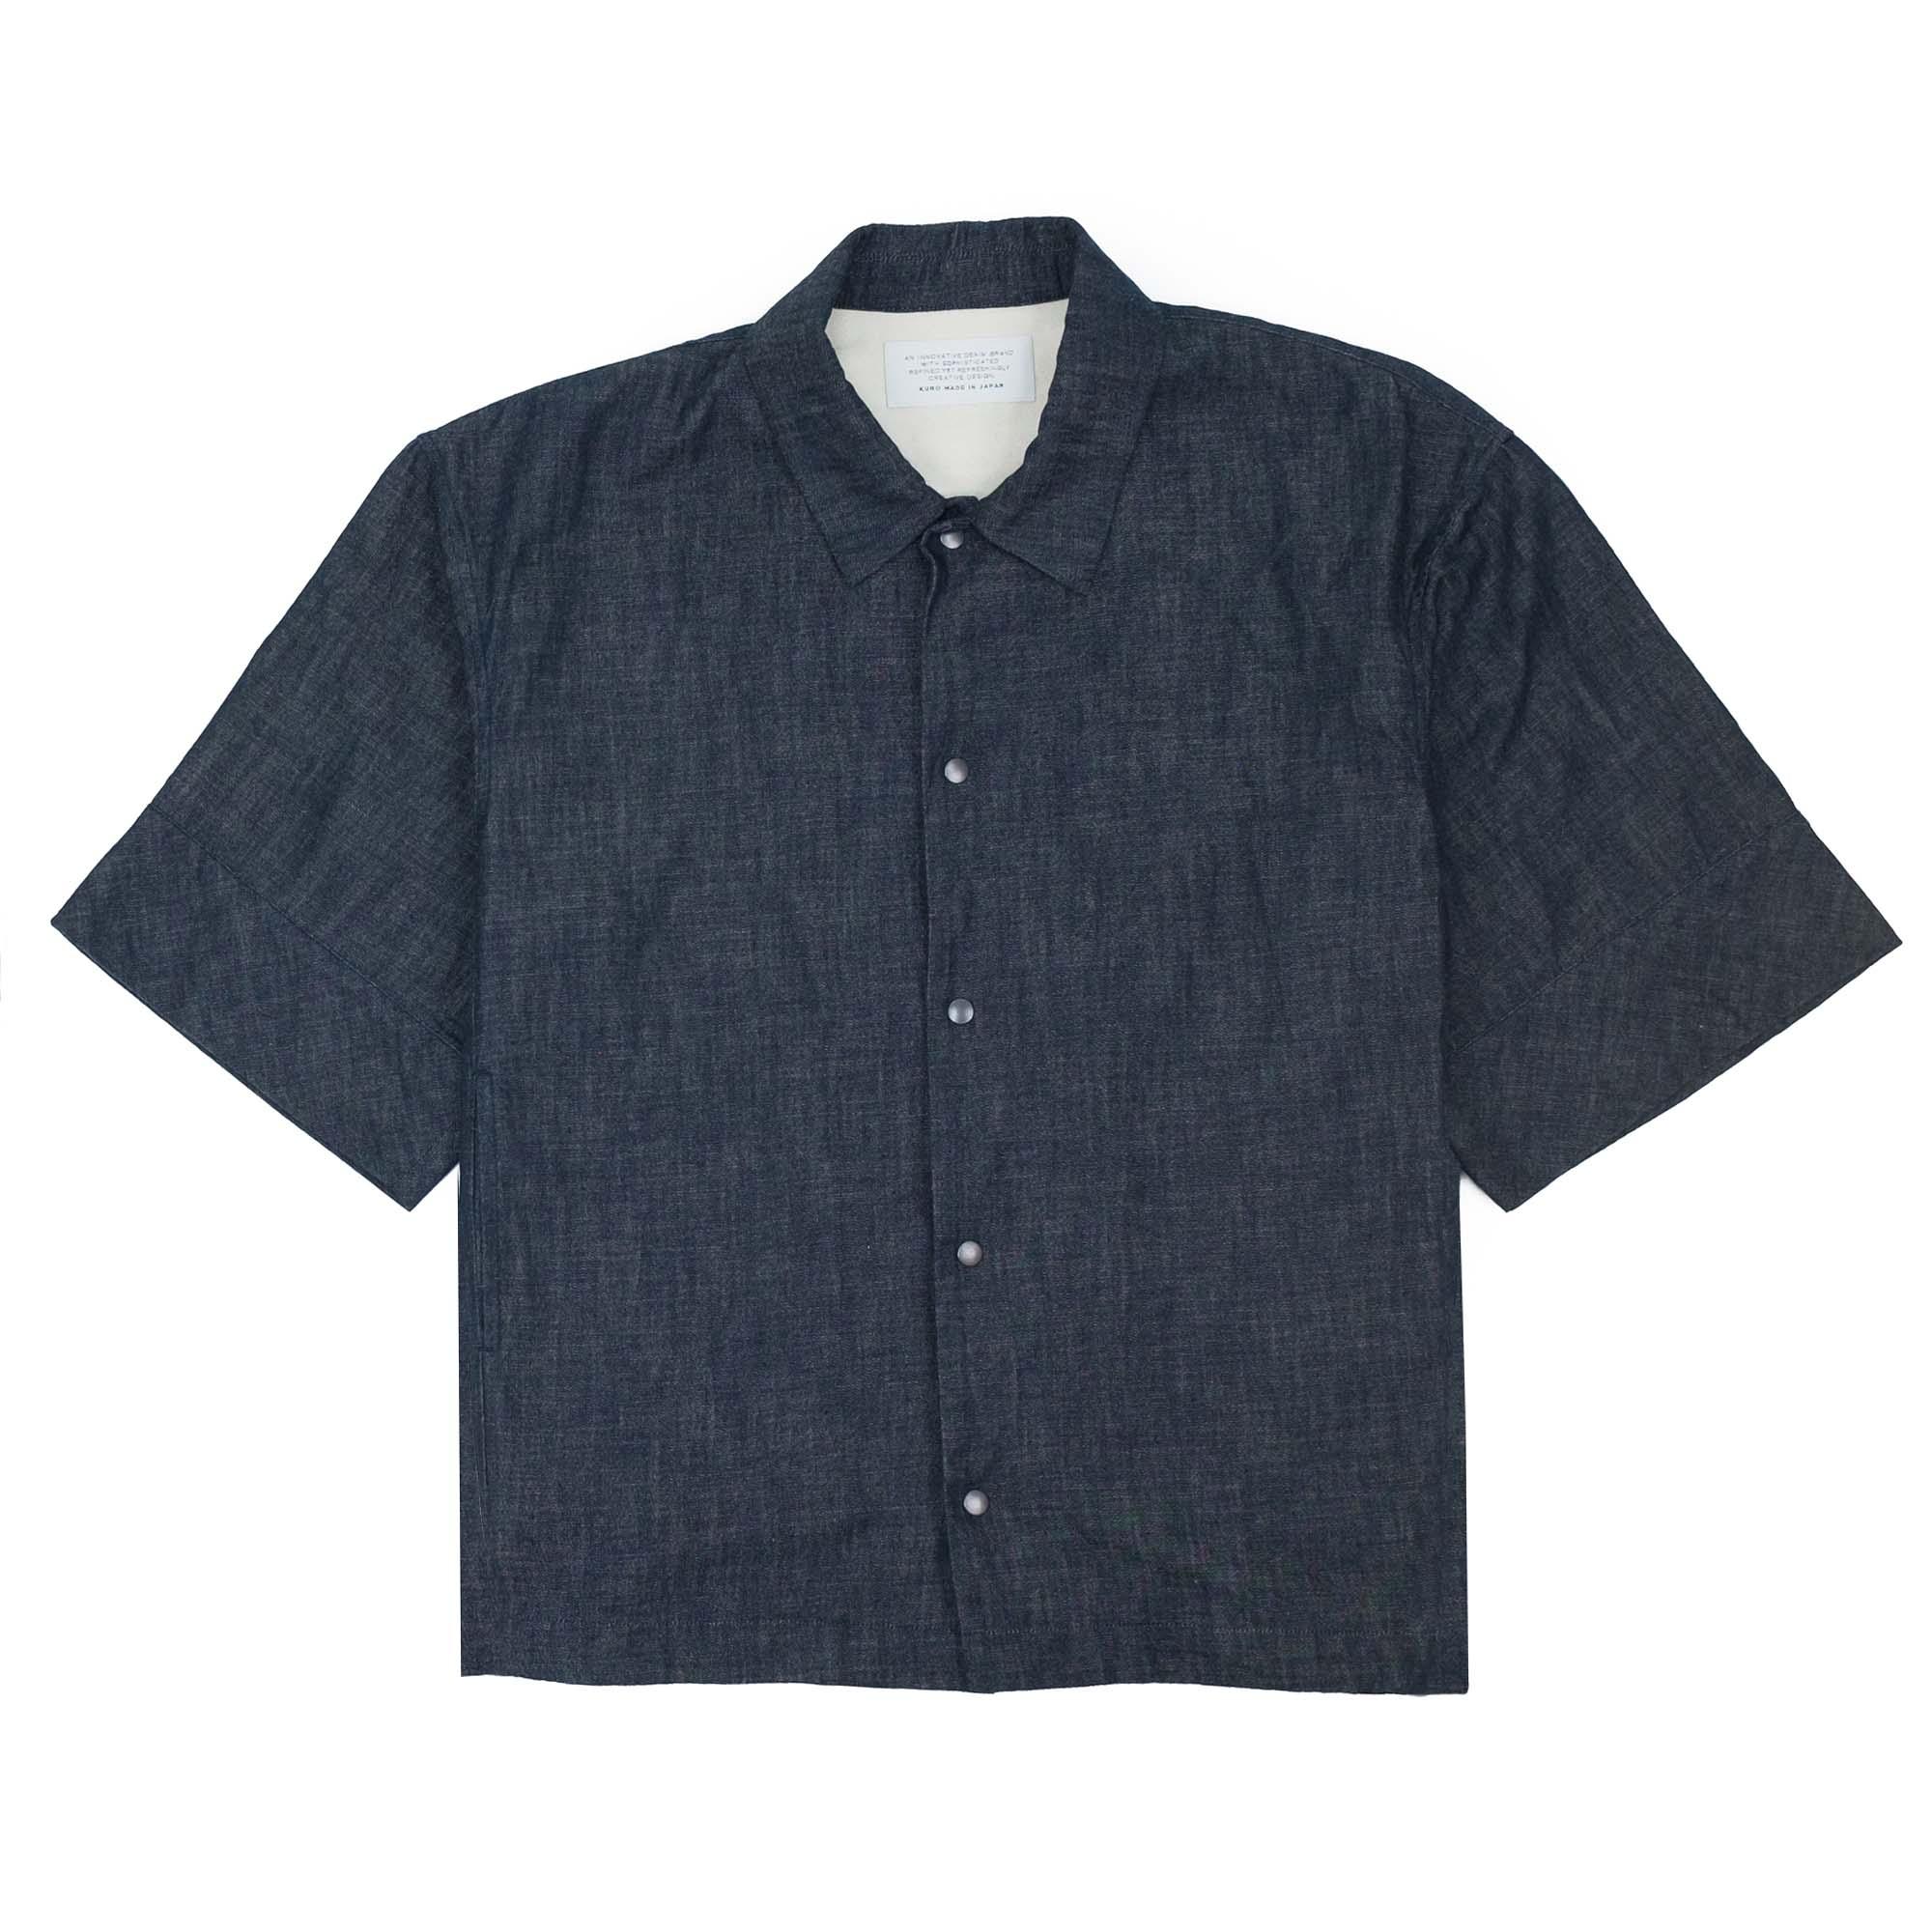 Kuro Denim Short Sleeve Coach Jacket